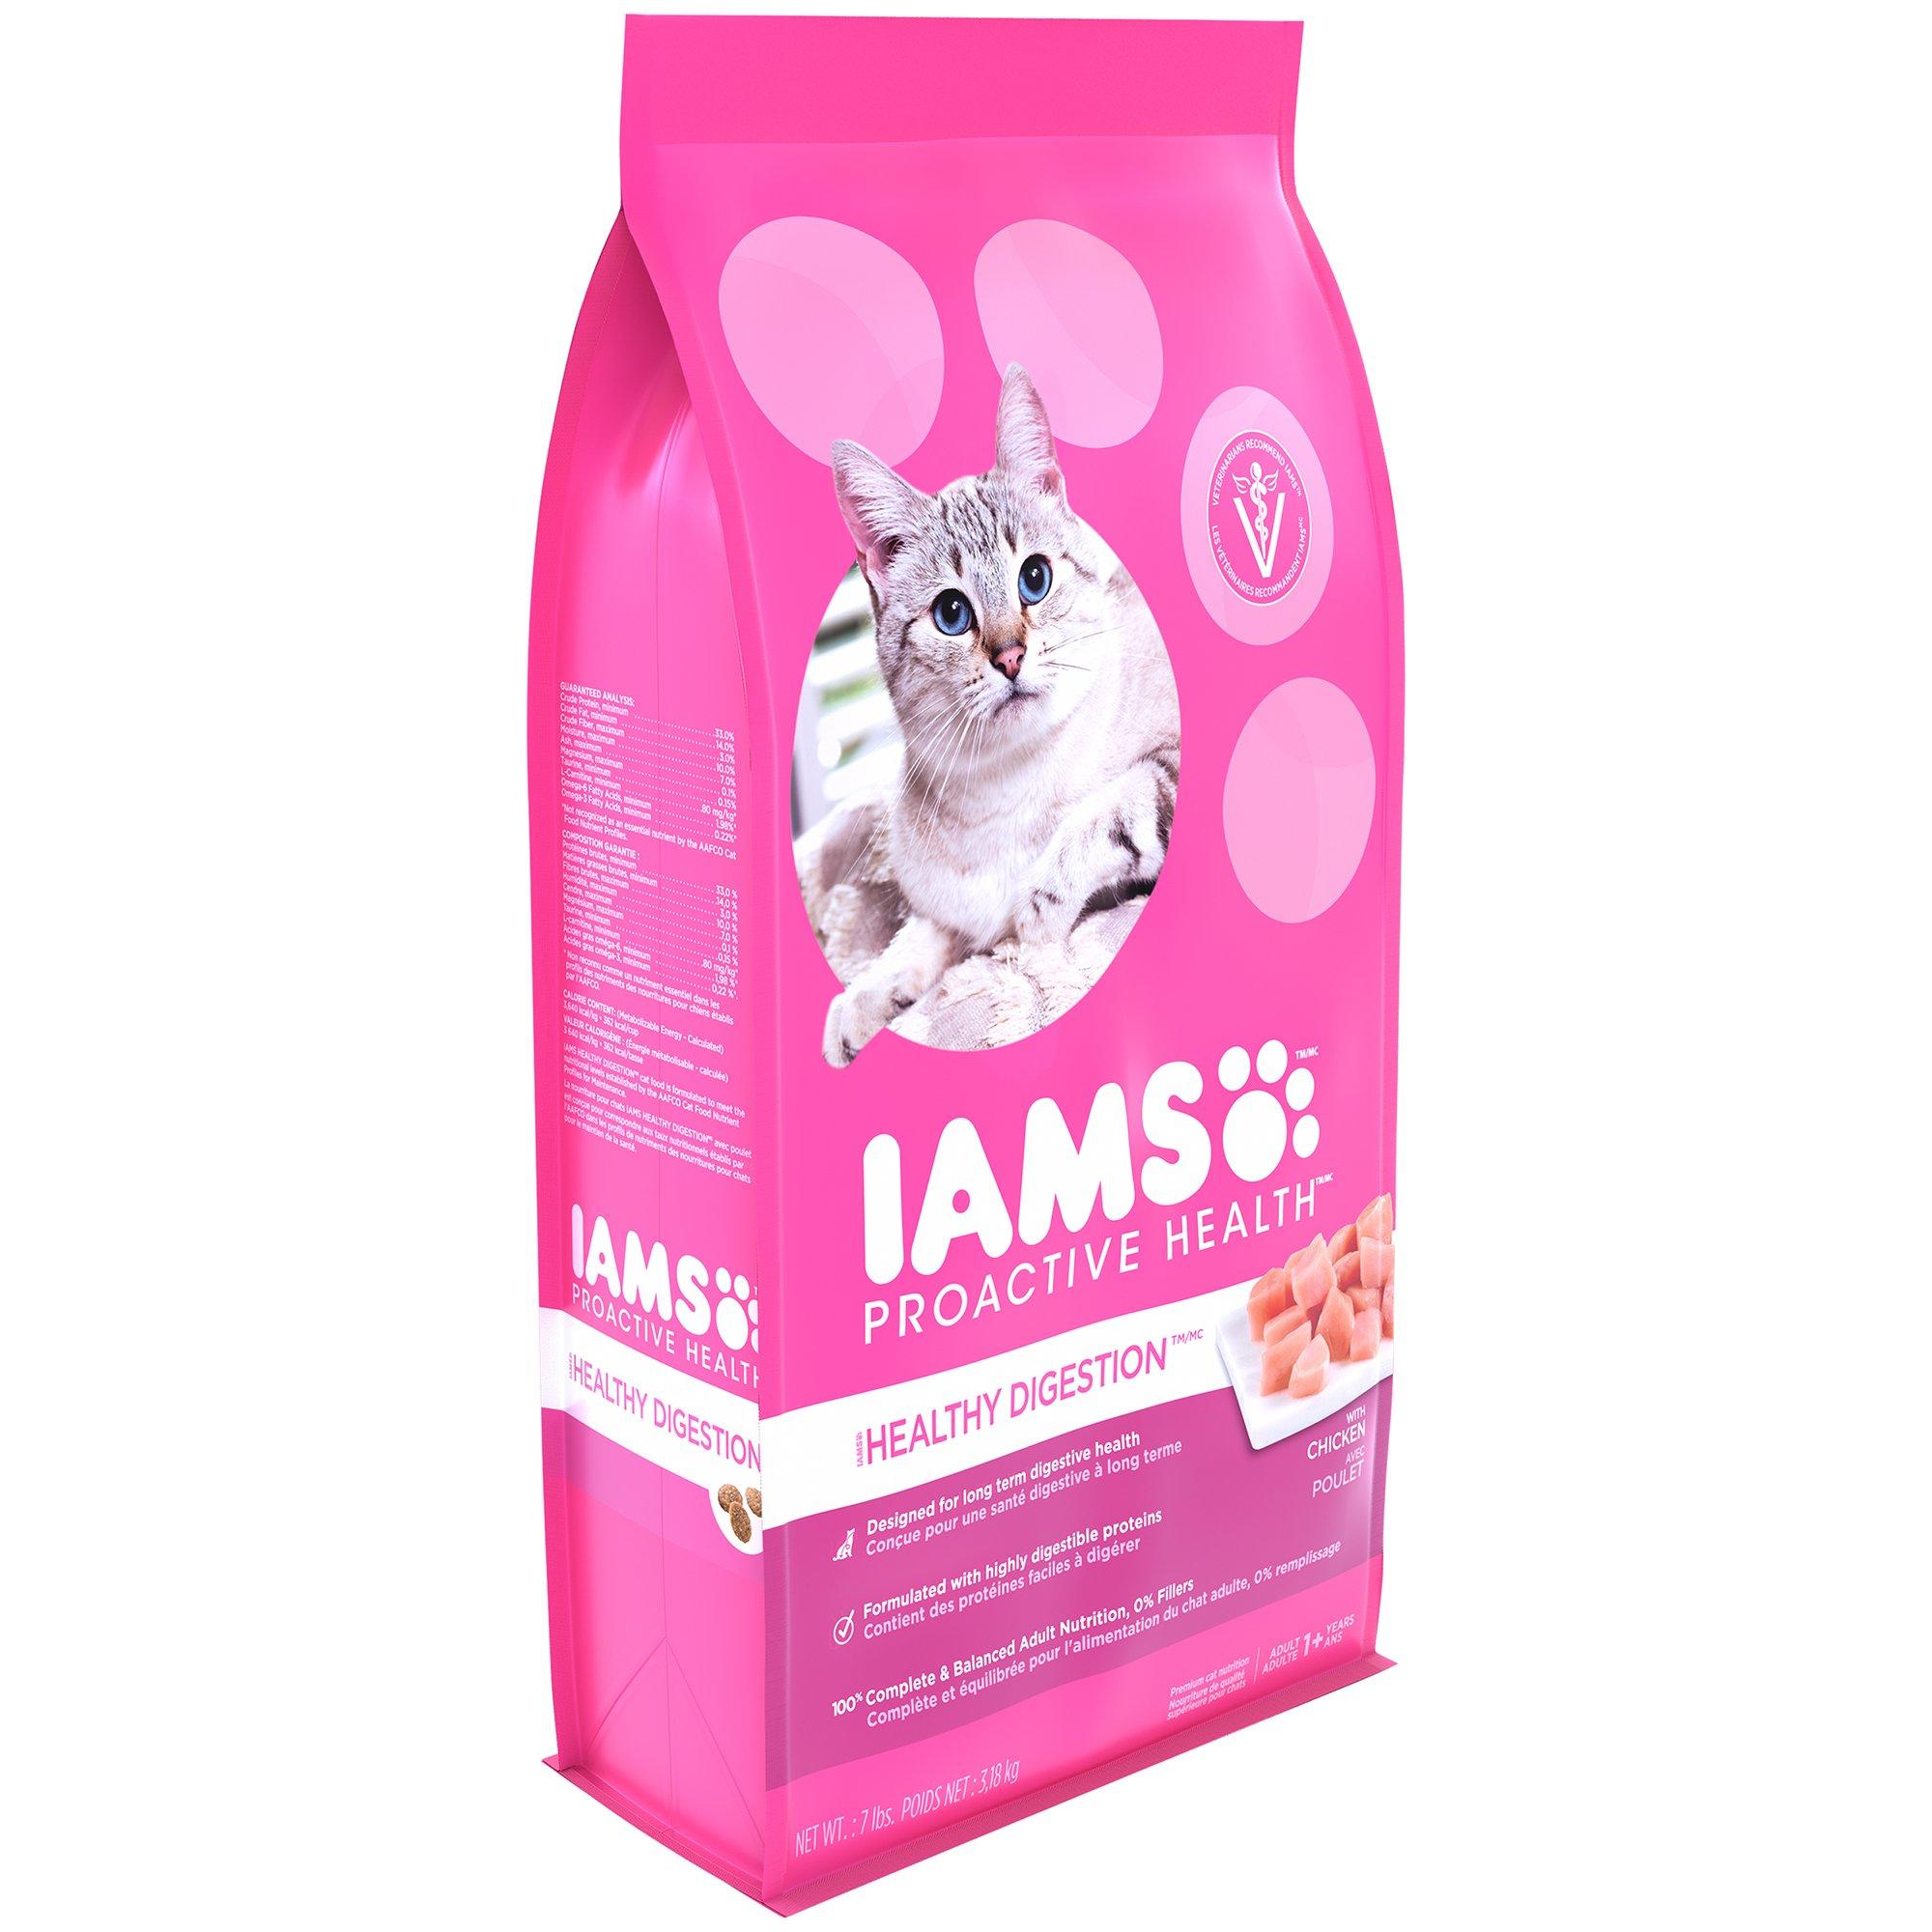 Iams PROACTIVE HEALTH Adult Healthy Digestion Dry Cat Food Chicken Turkey, 7 lb. Bag